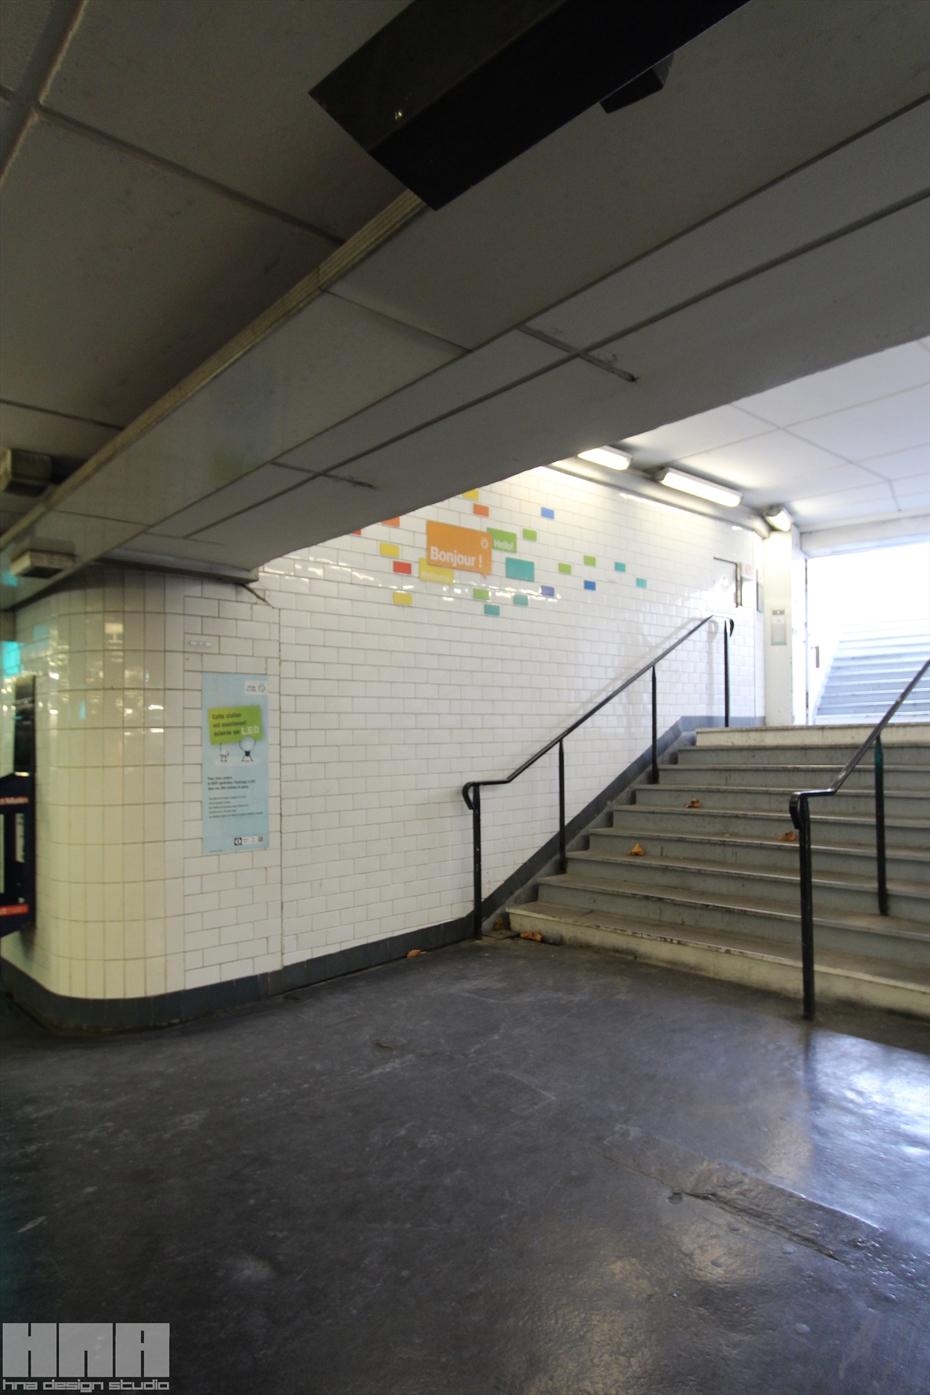 parizs metro 30